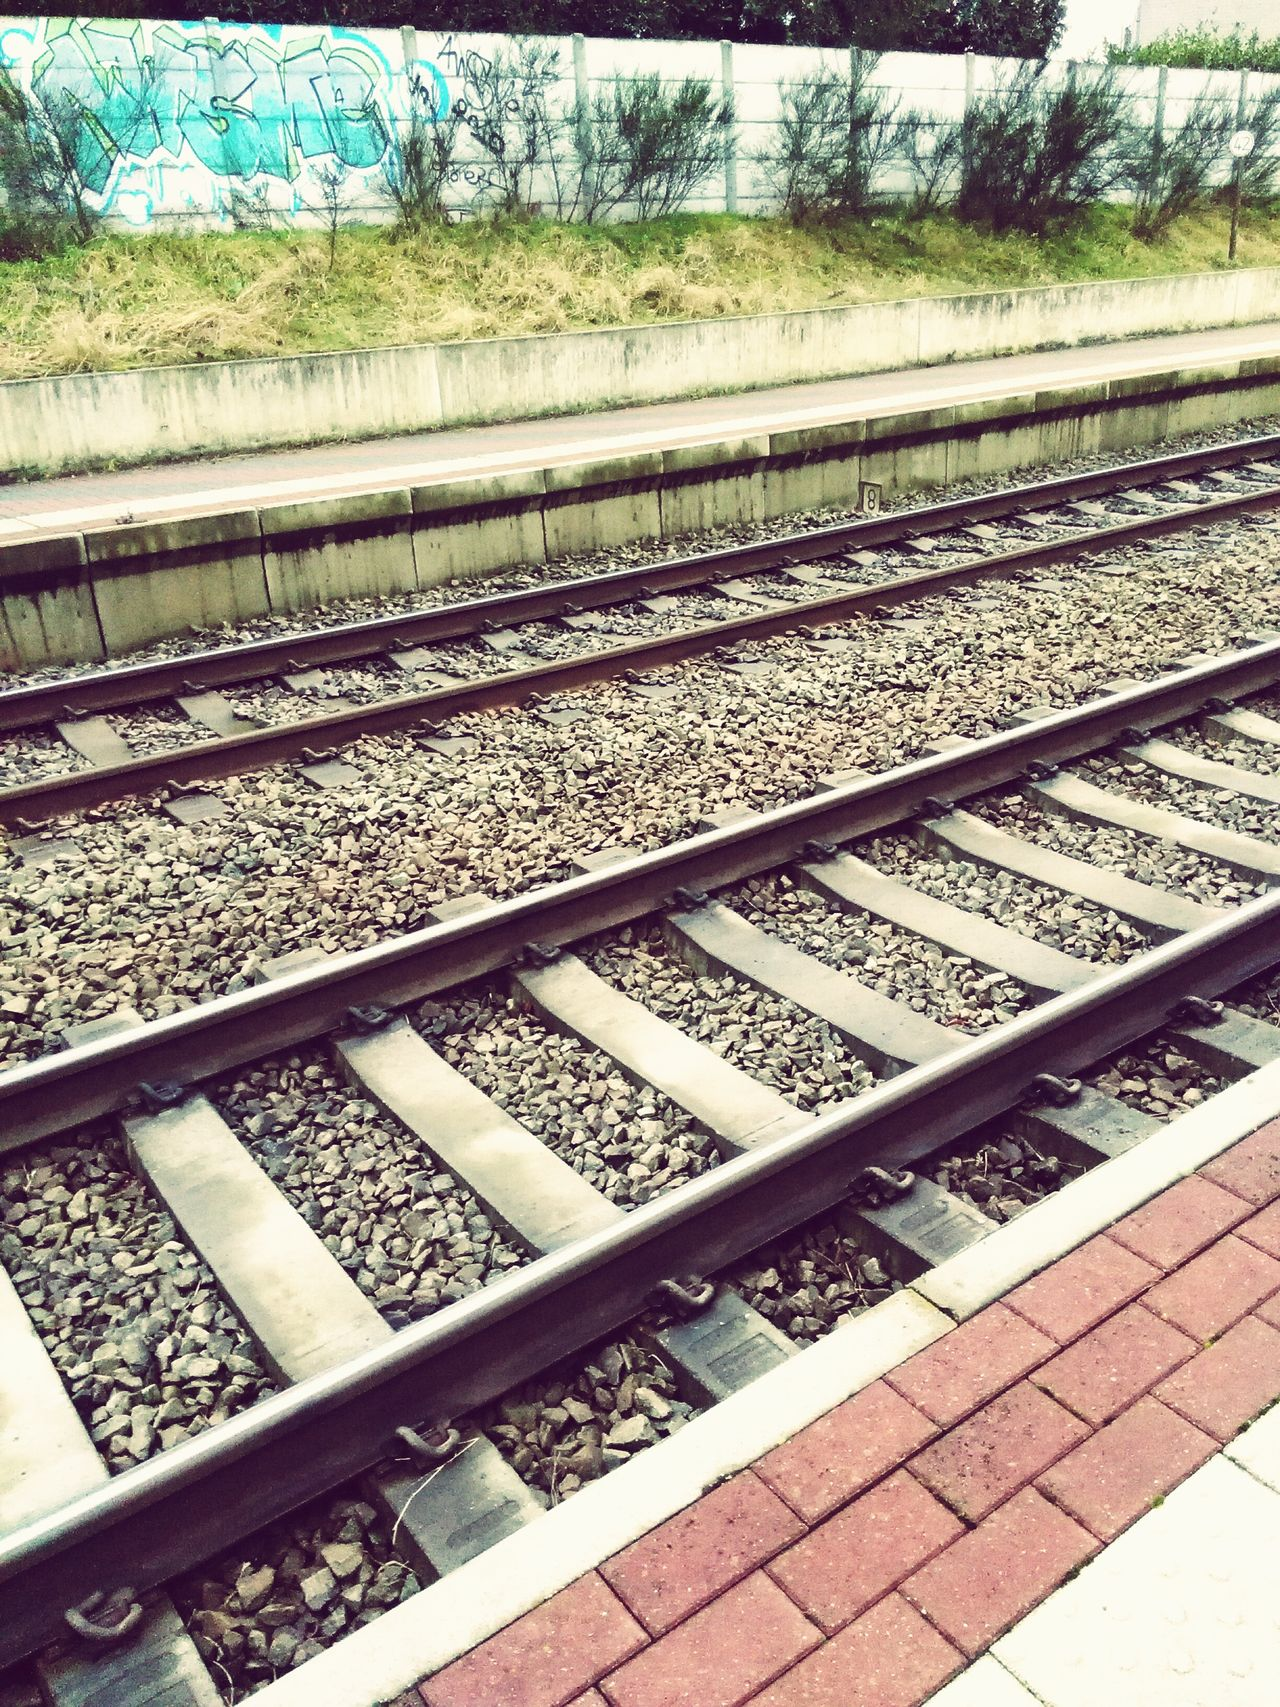 Train Station Train Rails Railway Track Stones